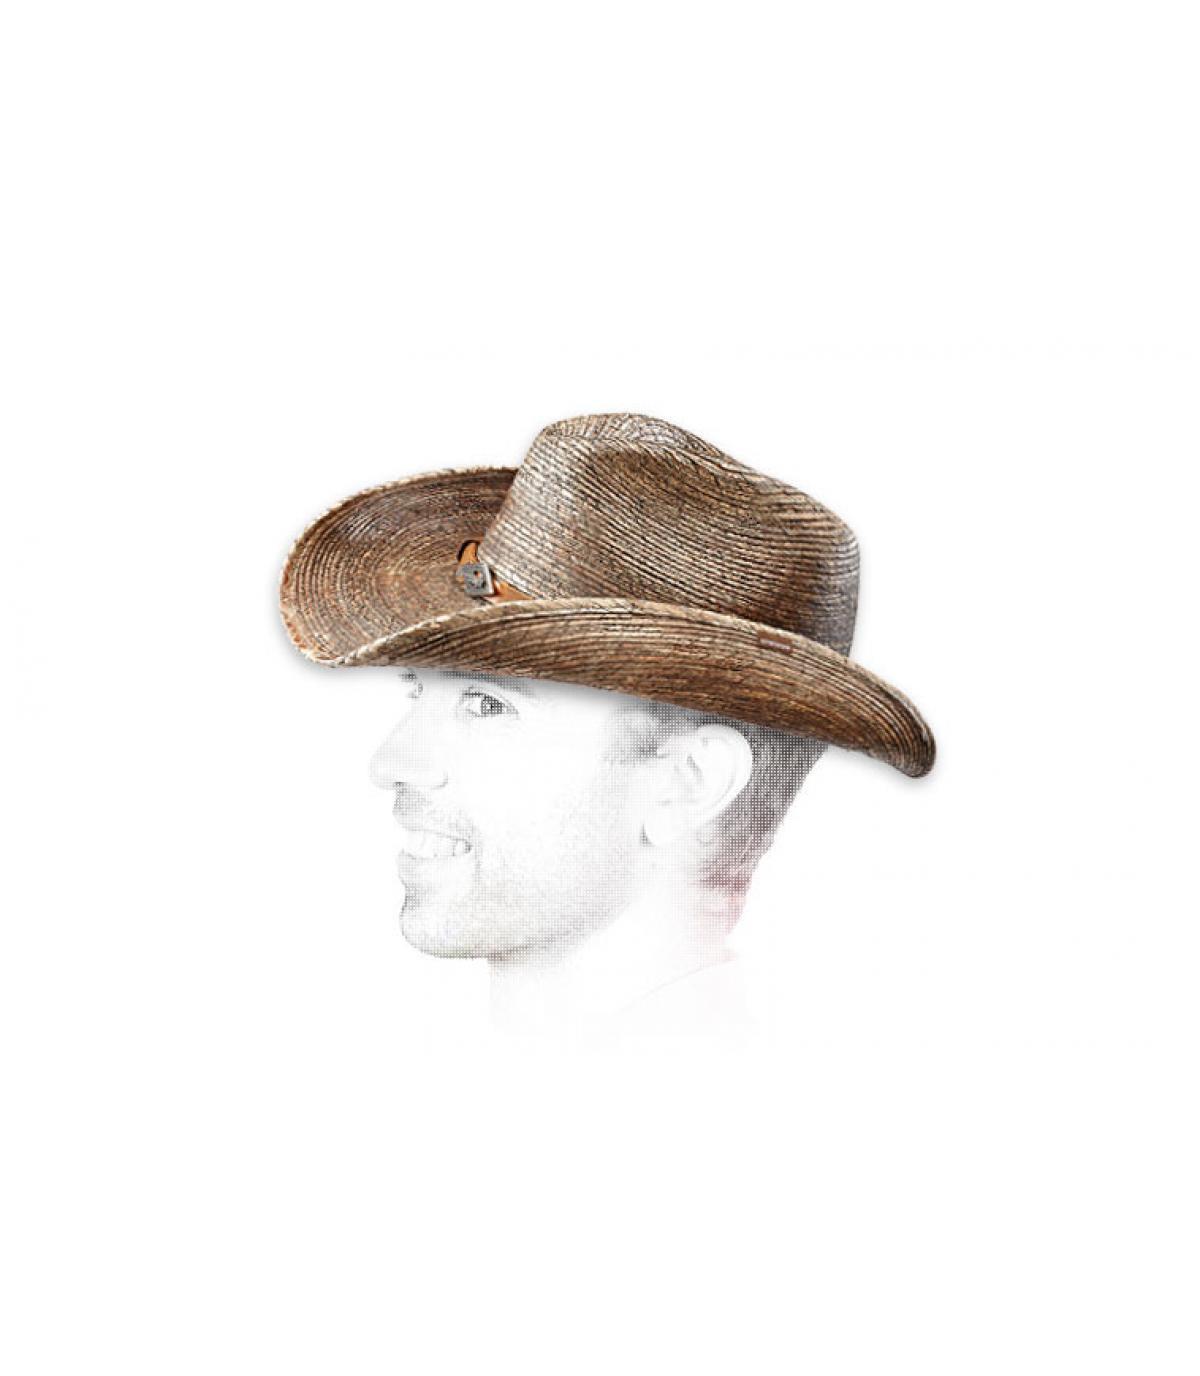 Sombrero paja cow boy hombre